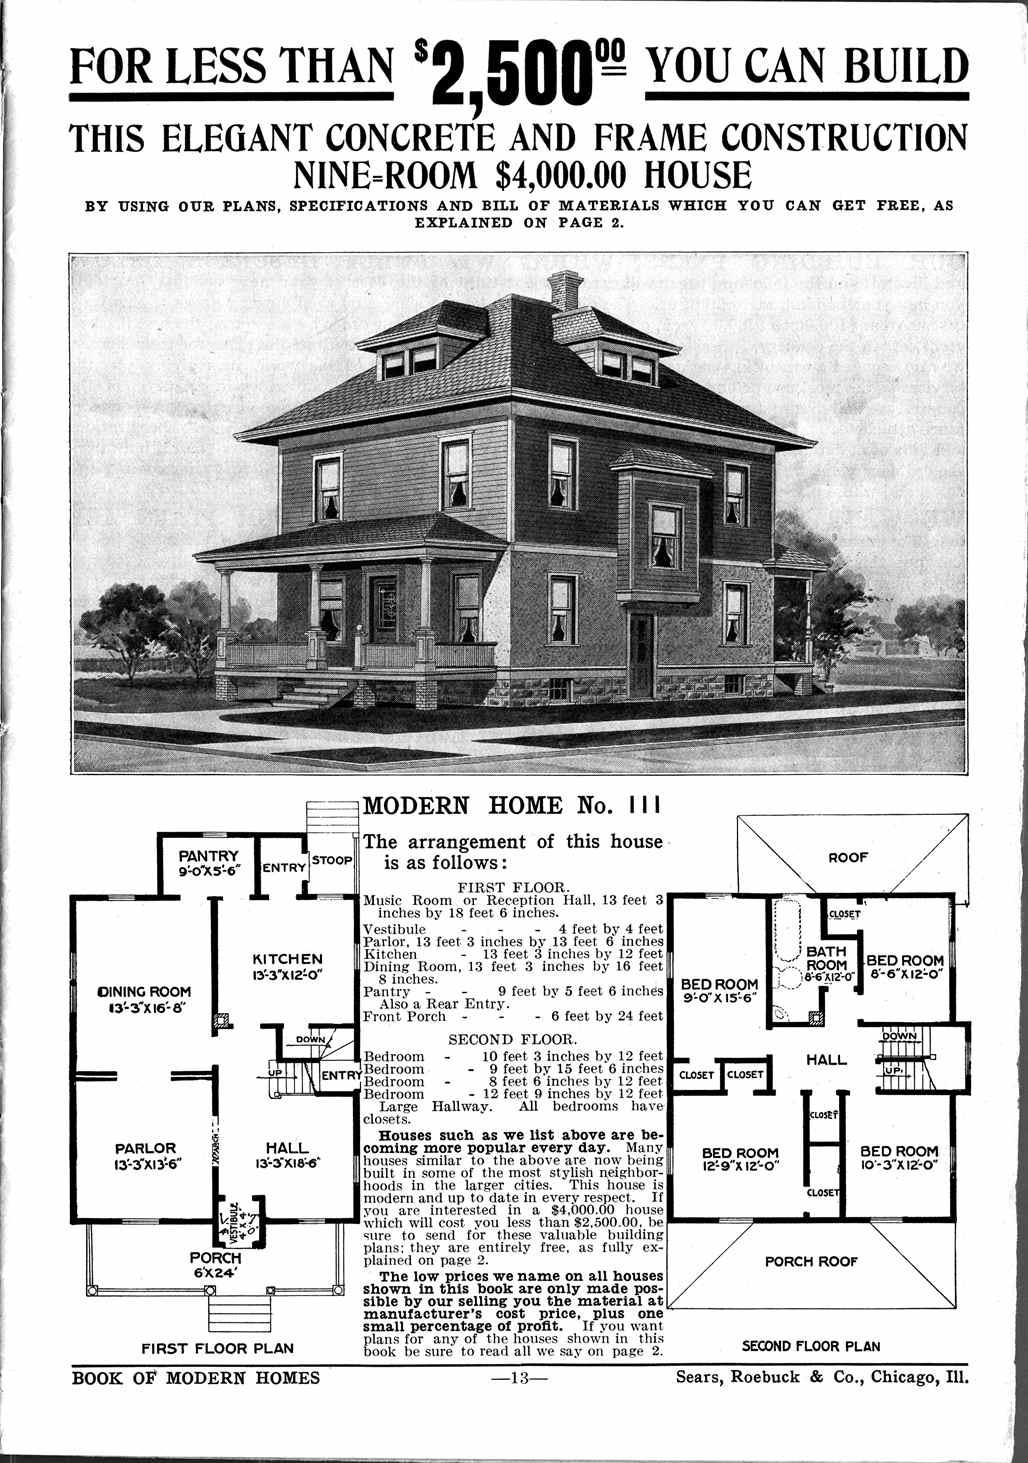 1920s sears catalog home still standing